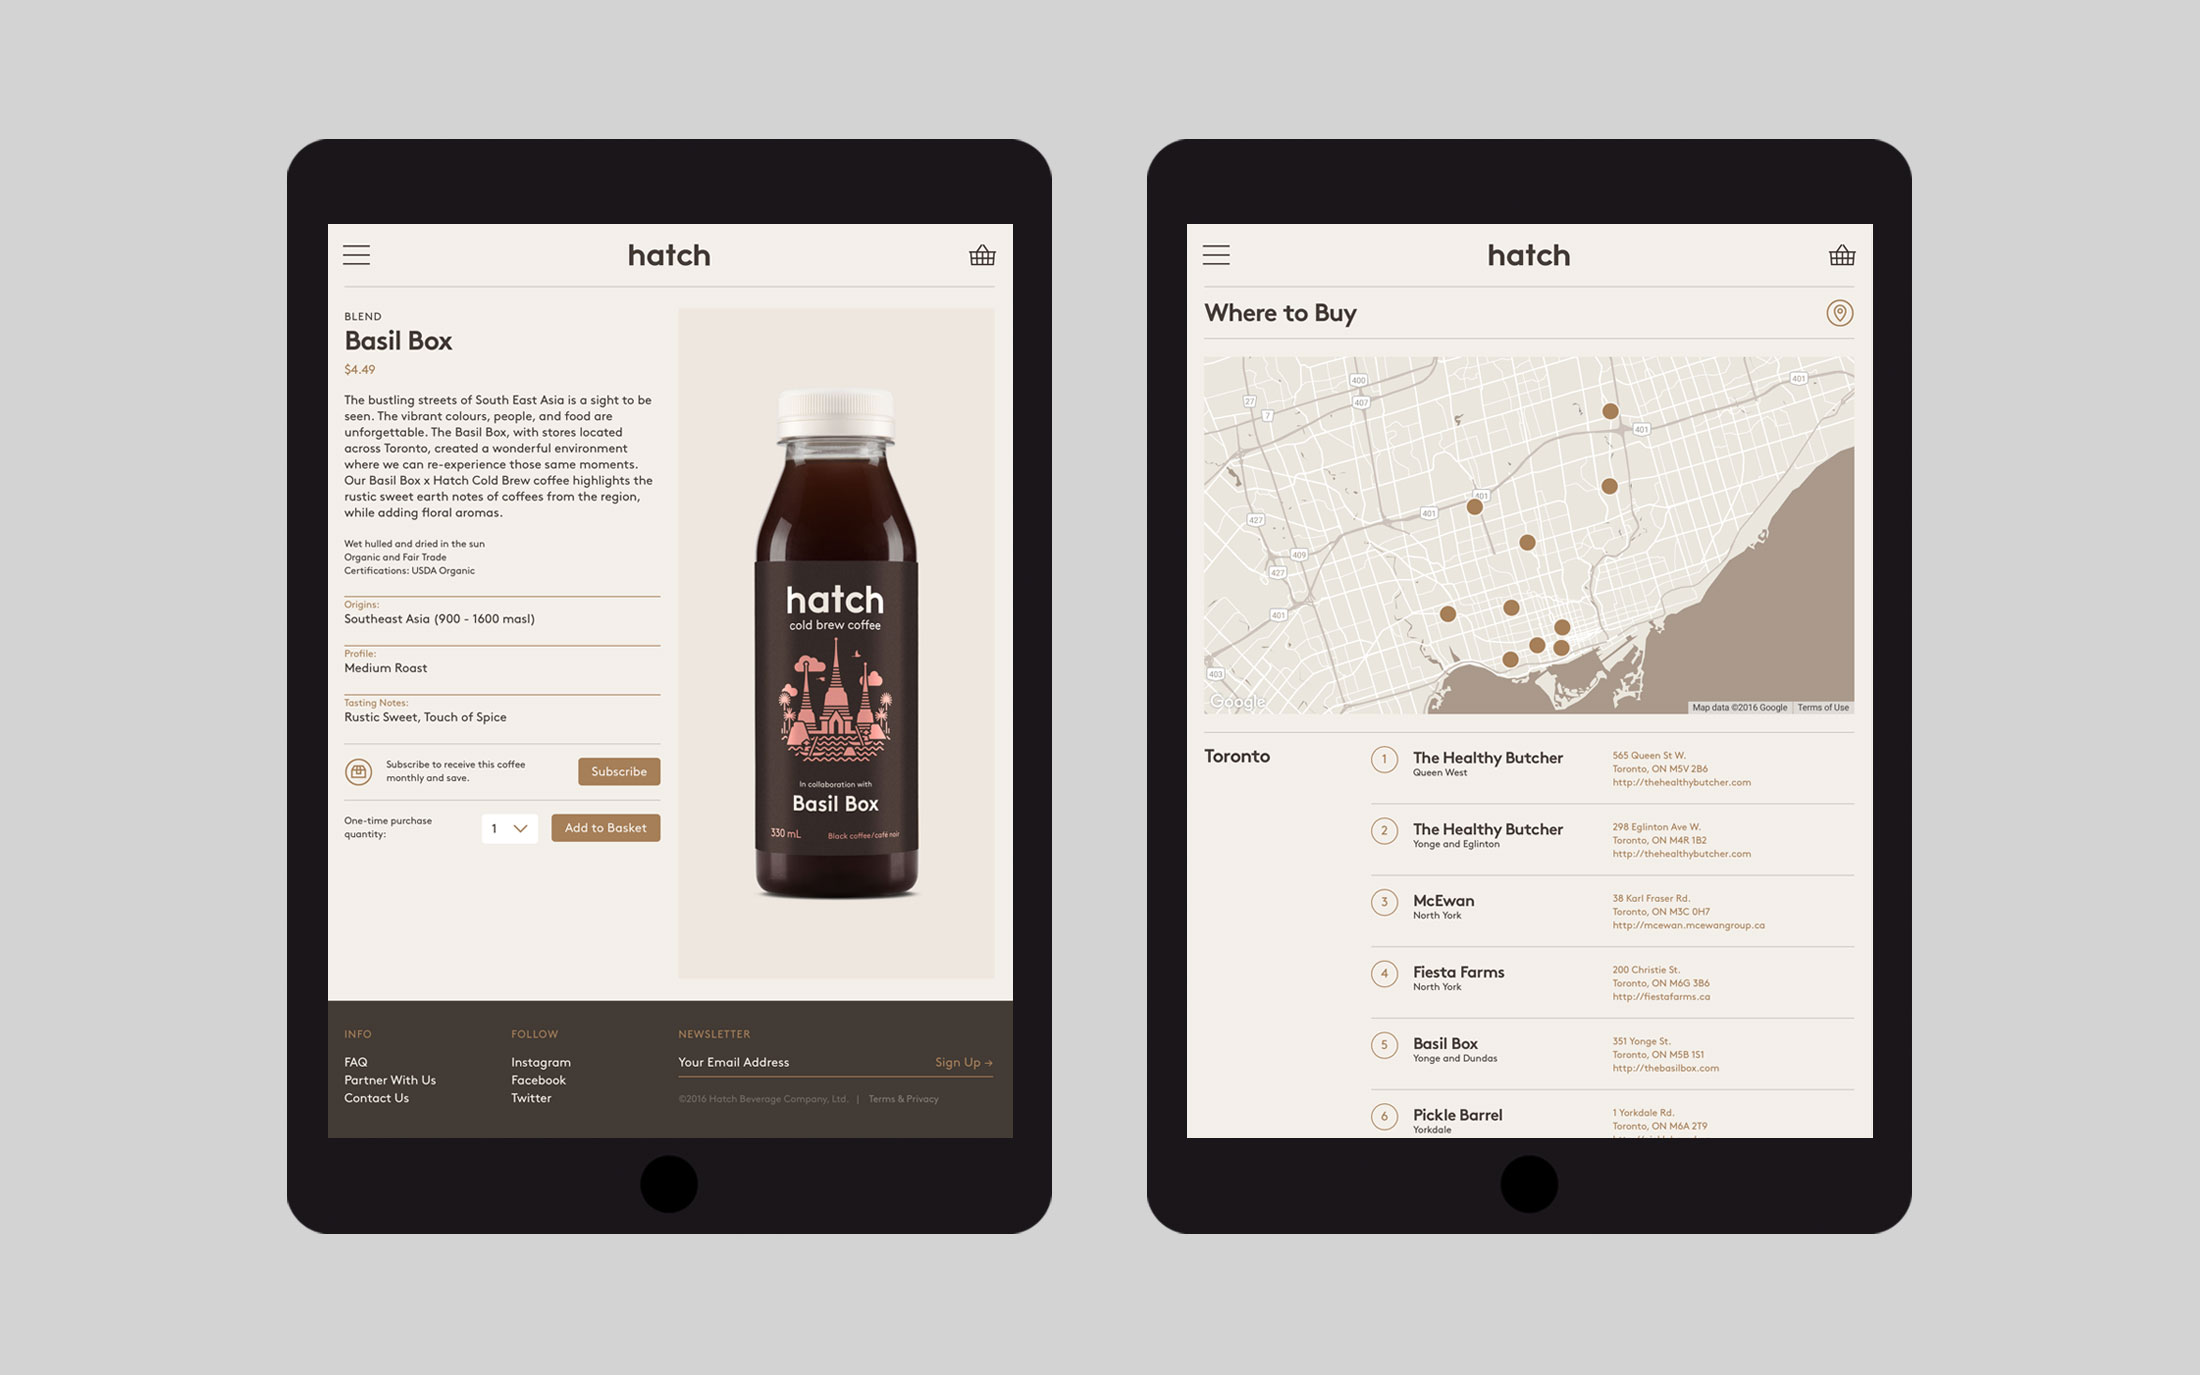 tung_hatch_website_tablet